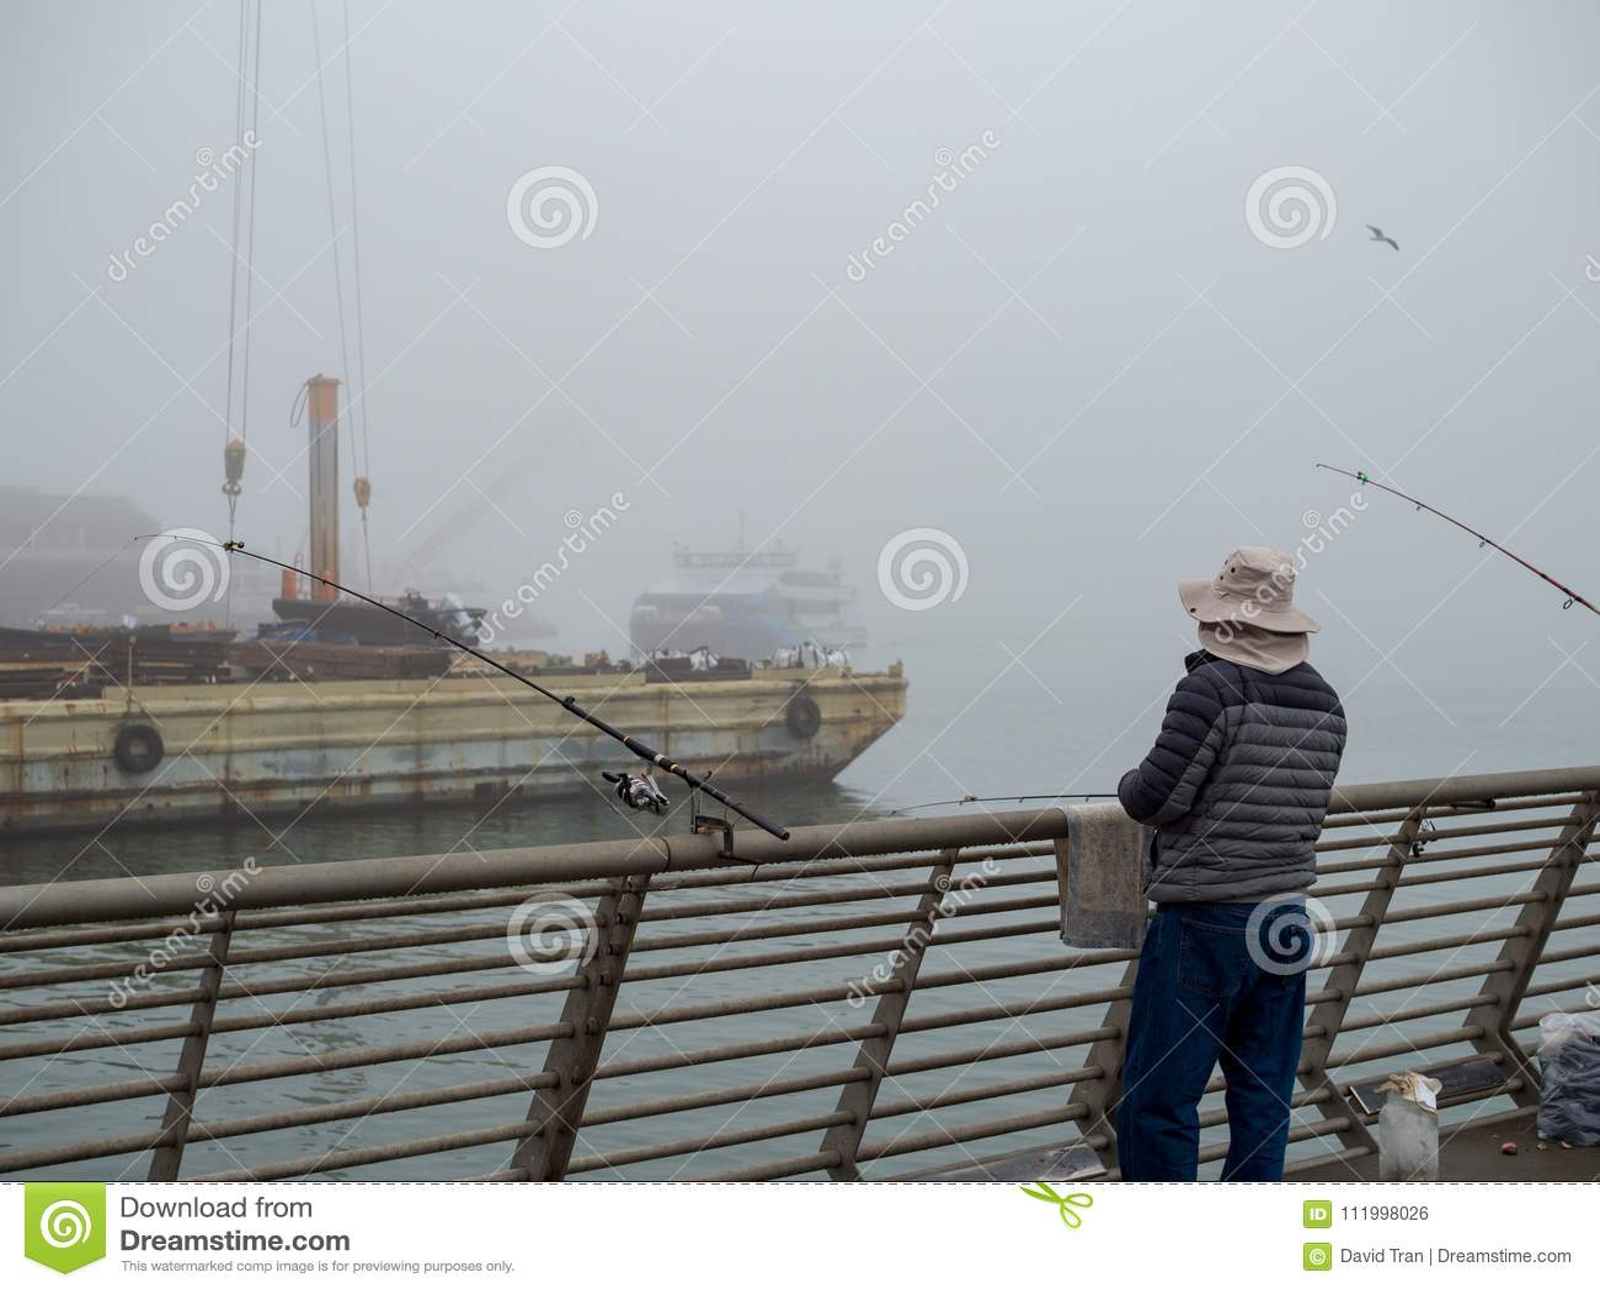 Fishermen on industrial pier on foggy day